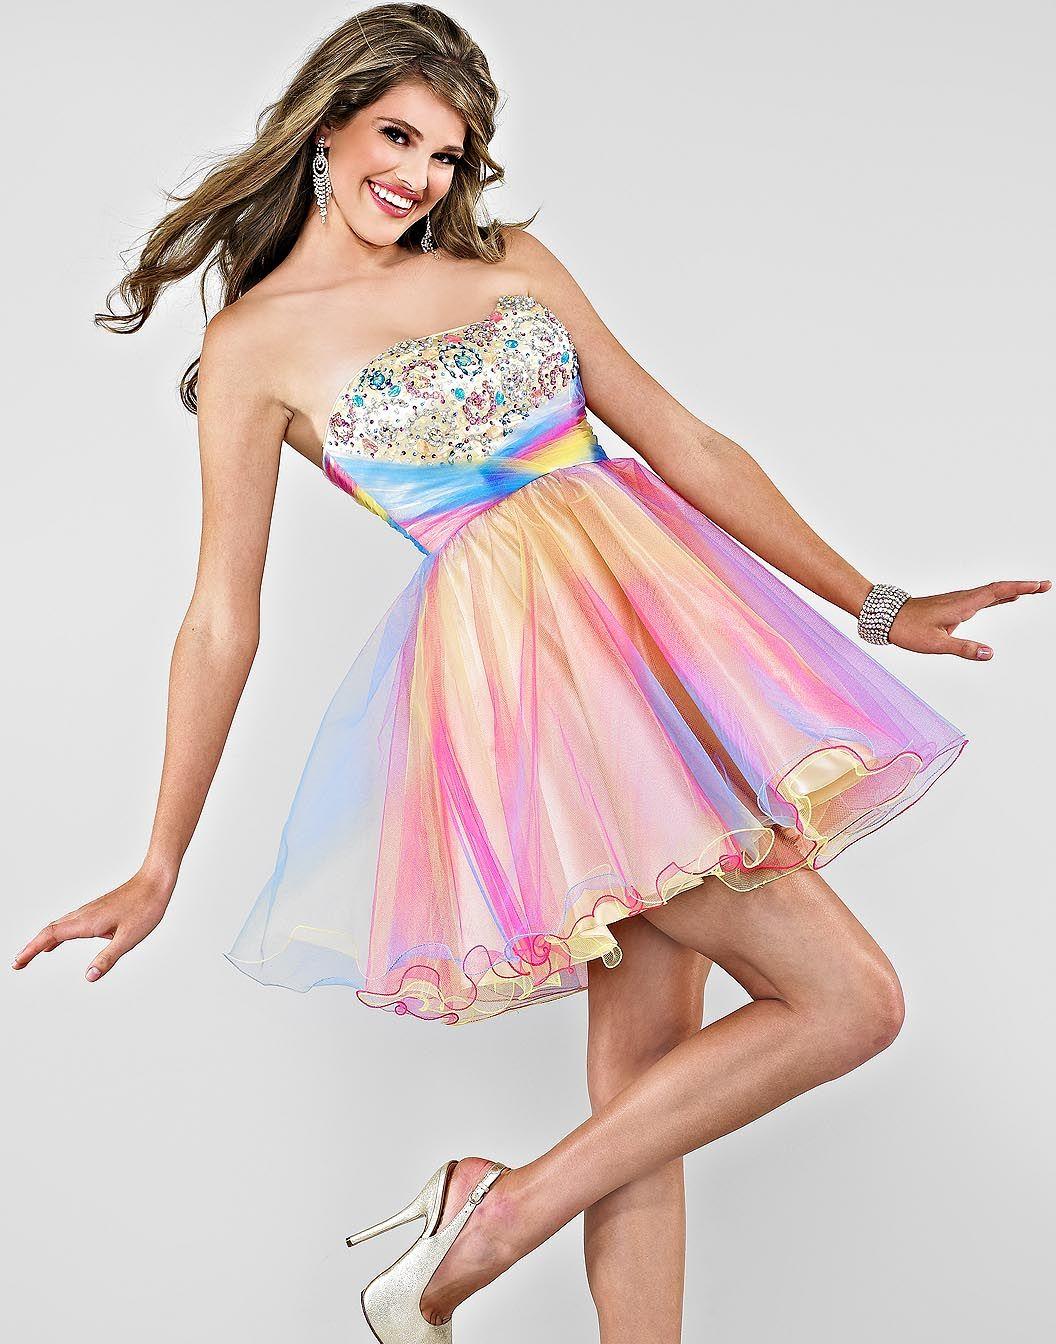 Imagesforfree Org Rainbow Prom Dress Prom Dresses Short Short Strapless Prom Dresses [ 1344 x 1056 Pixel ]